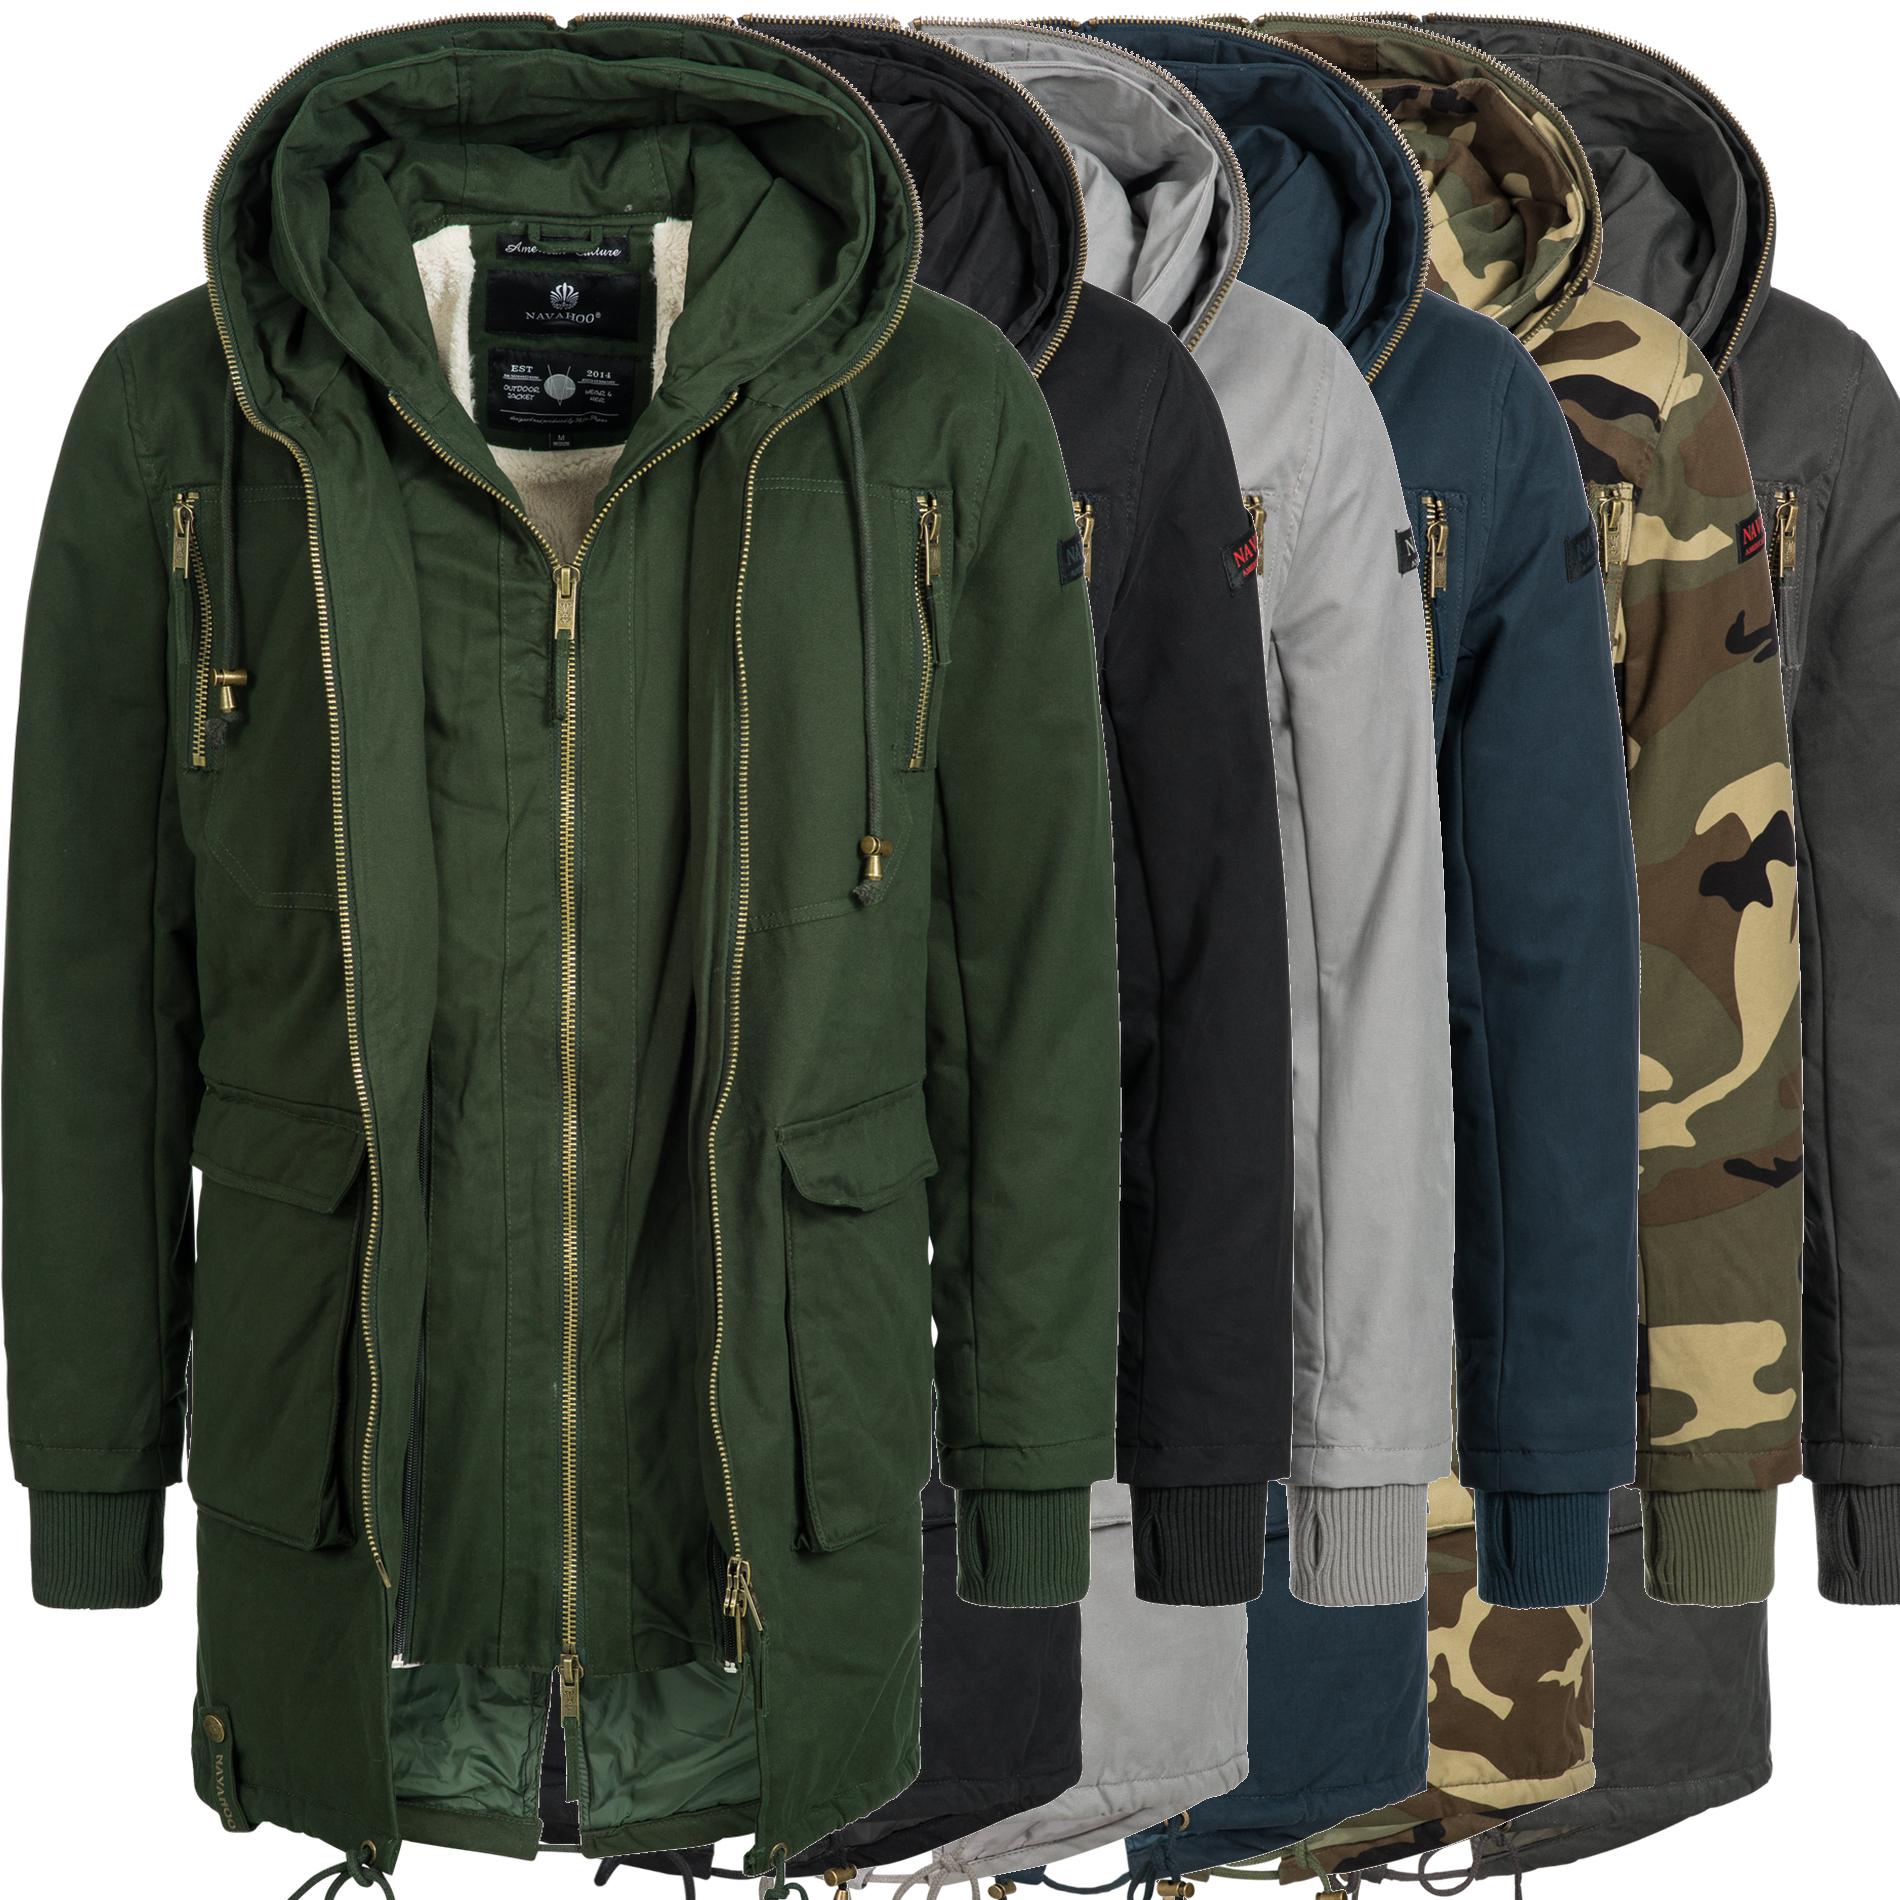 Winterjacke Mantel Details Doublezipper Winter Jacke Warm Omassasin Parka Herren Zu Navahoo OPkwn0